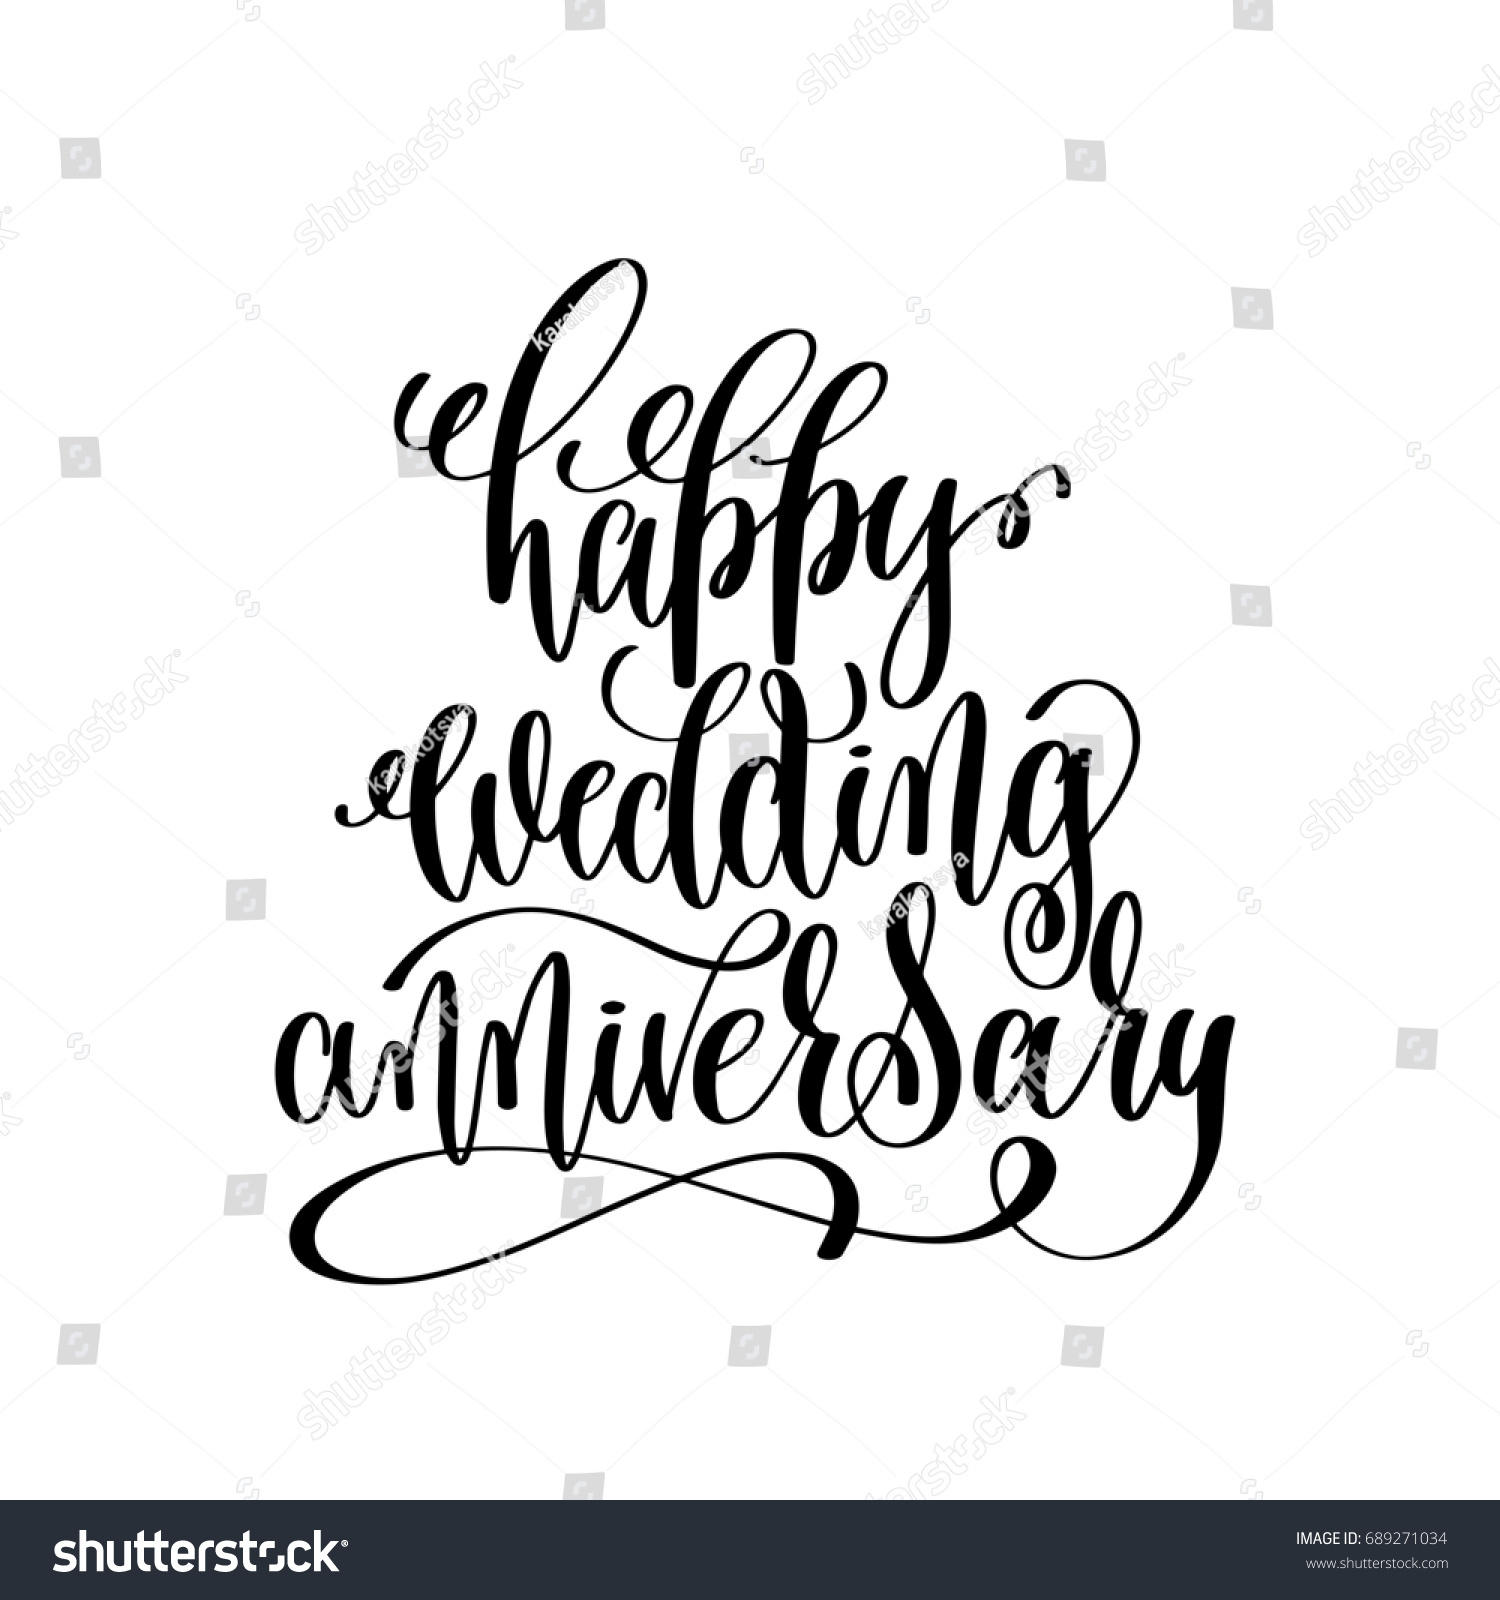 royalty free stock illustration of happy wedding anniversary black 1 Year Wedding Anniversary happy wedding anniversary black and white hand ink lettering phrase celebration design greeting card